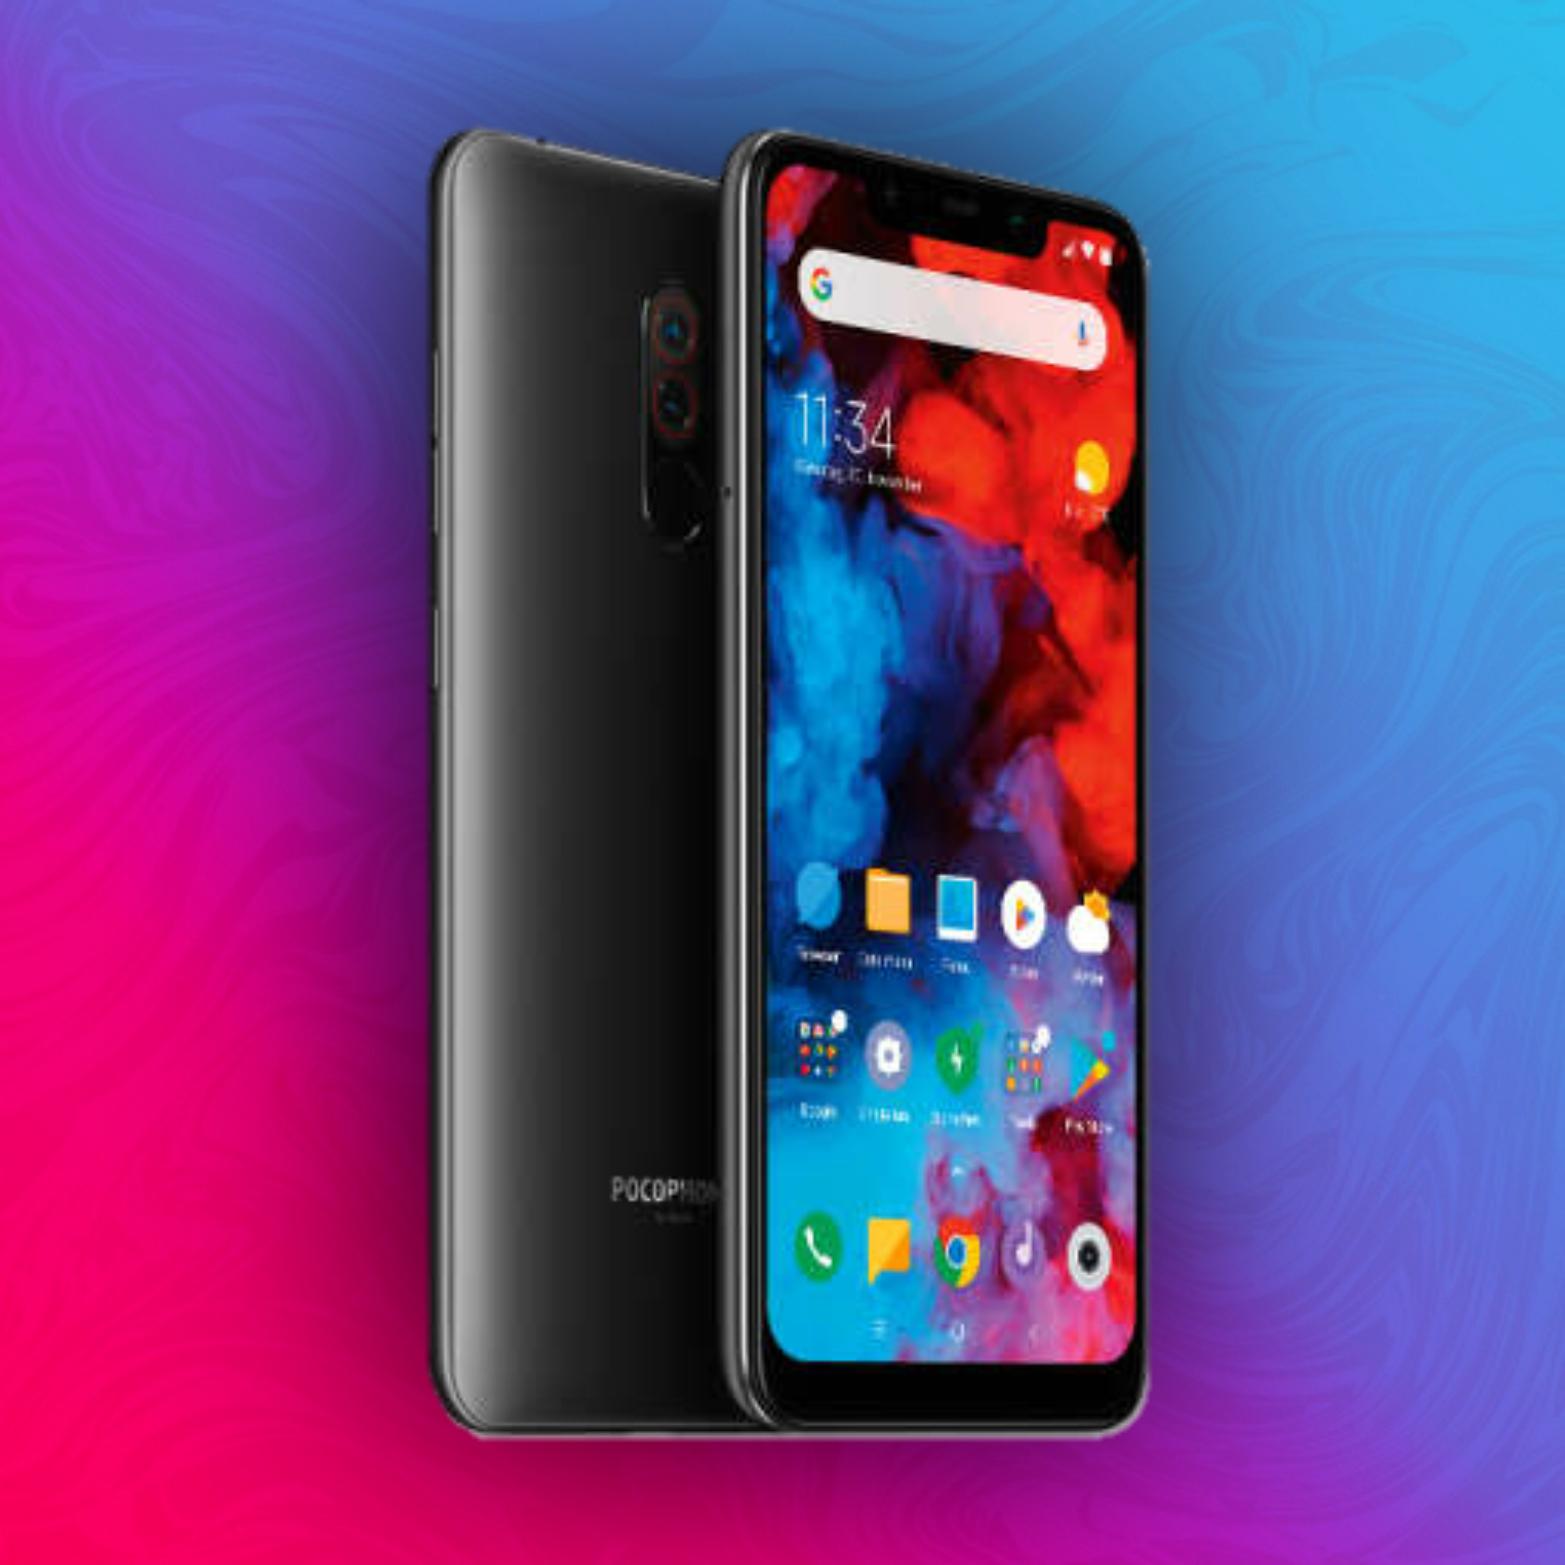 Xiaomi Pocophone F1 64/6GB - Snapdragon 845 - Global Version | 28,87€ in Rakuten SuperPoints